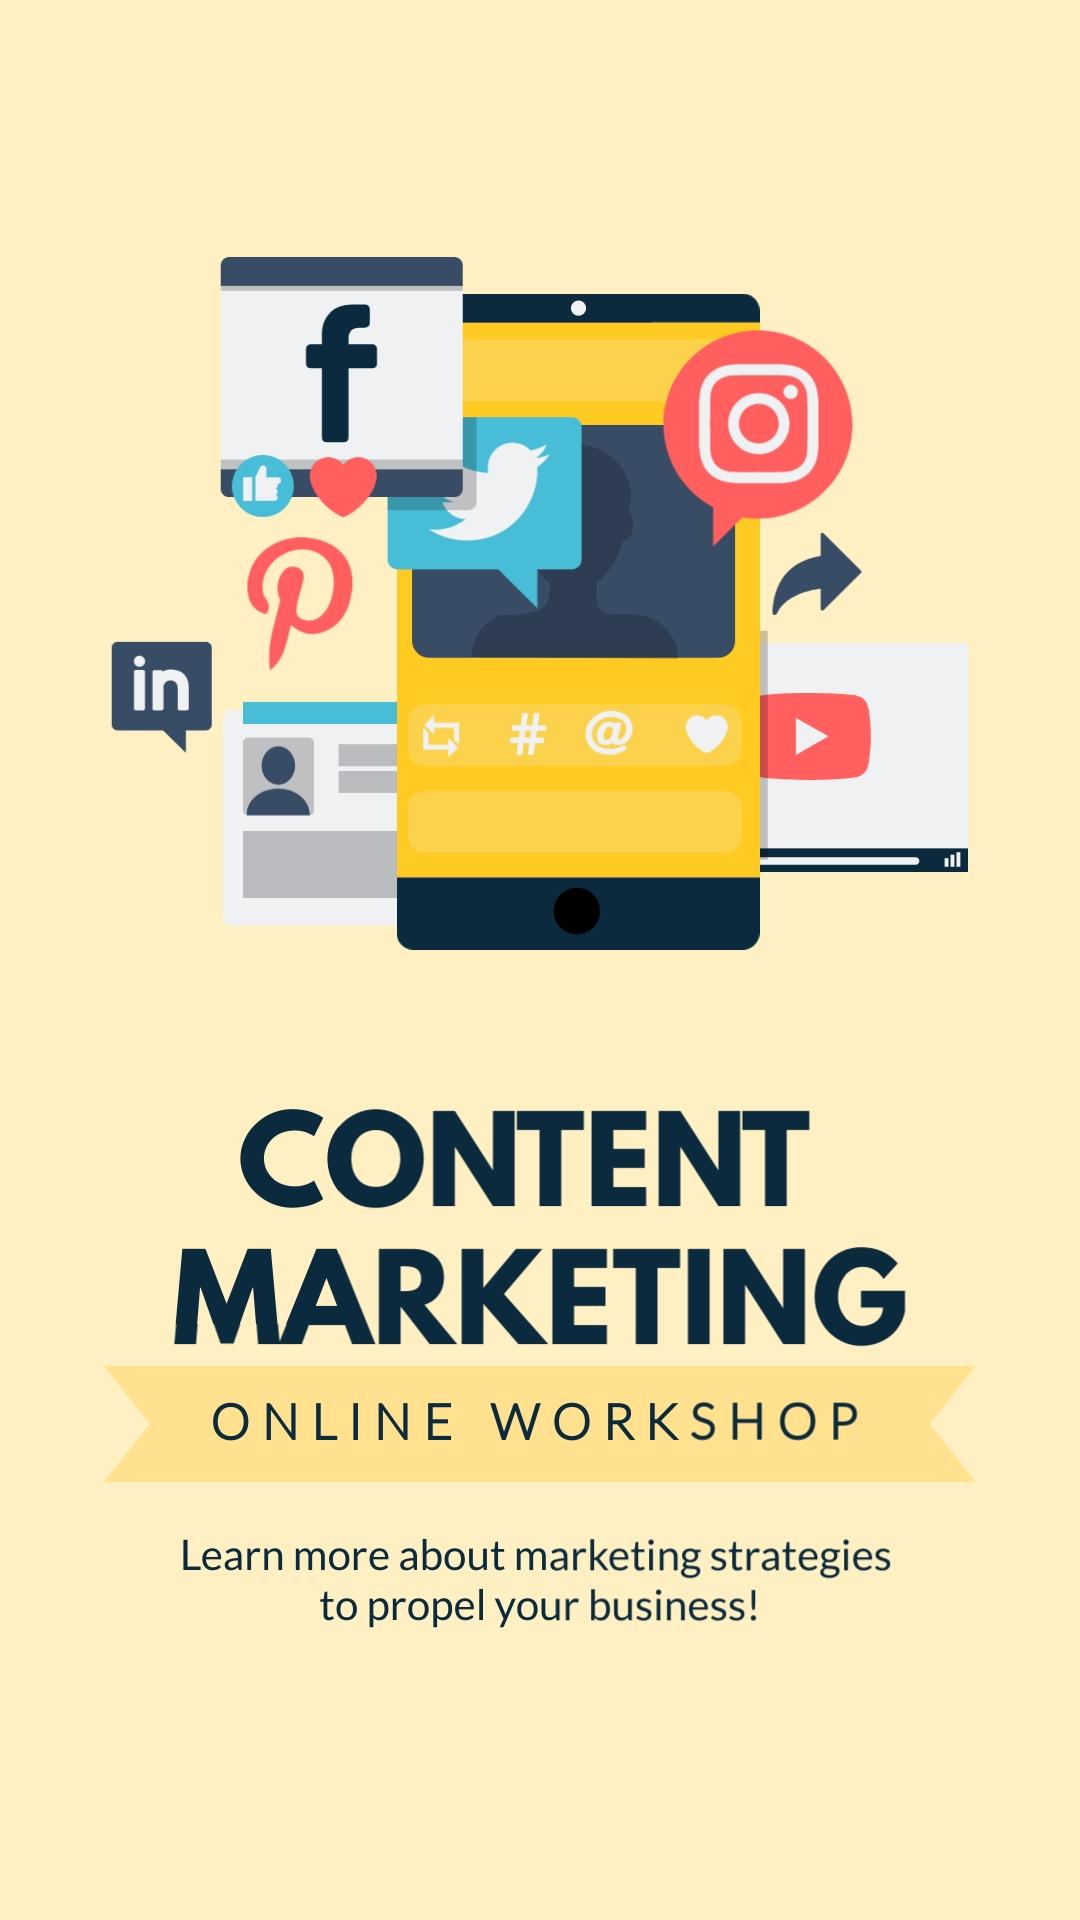 Content Marketing Workshop Vertical Template